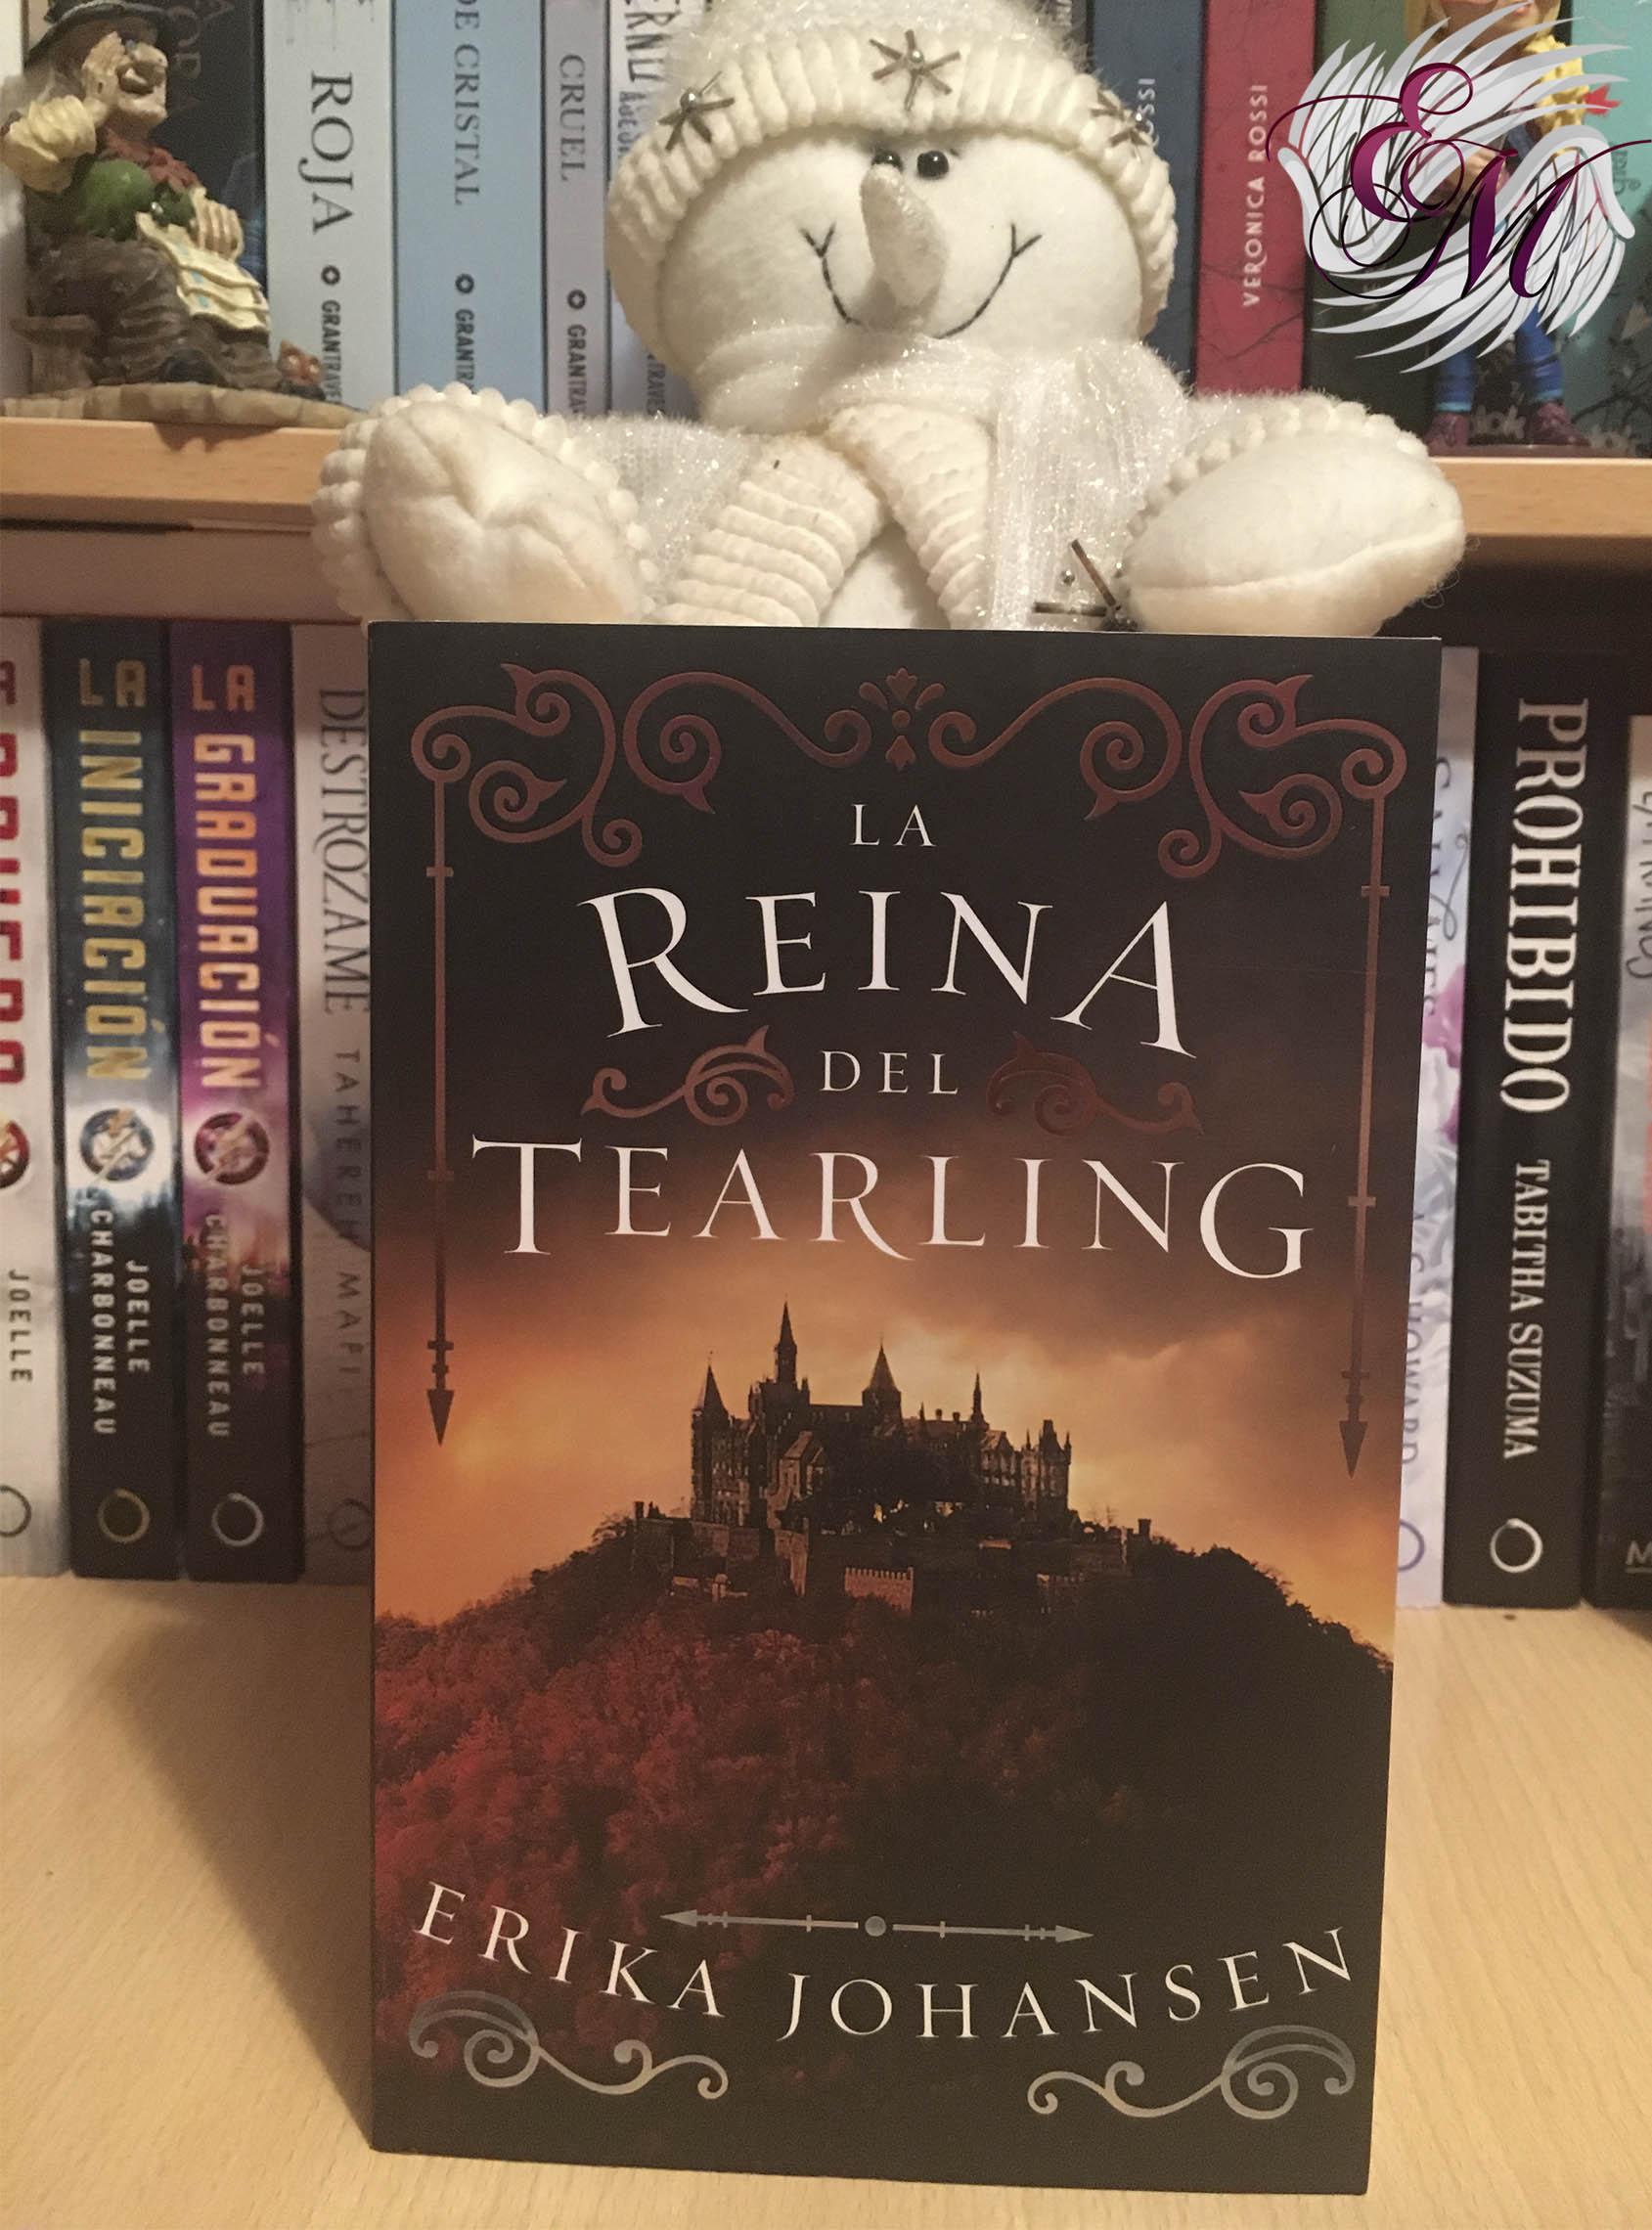 La reina del Tearling, de Erika Johansen - Reseña